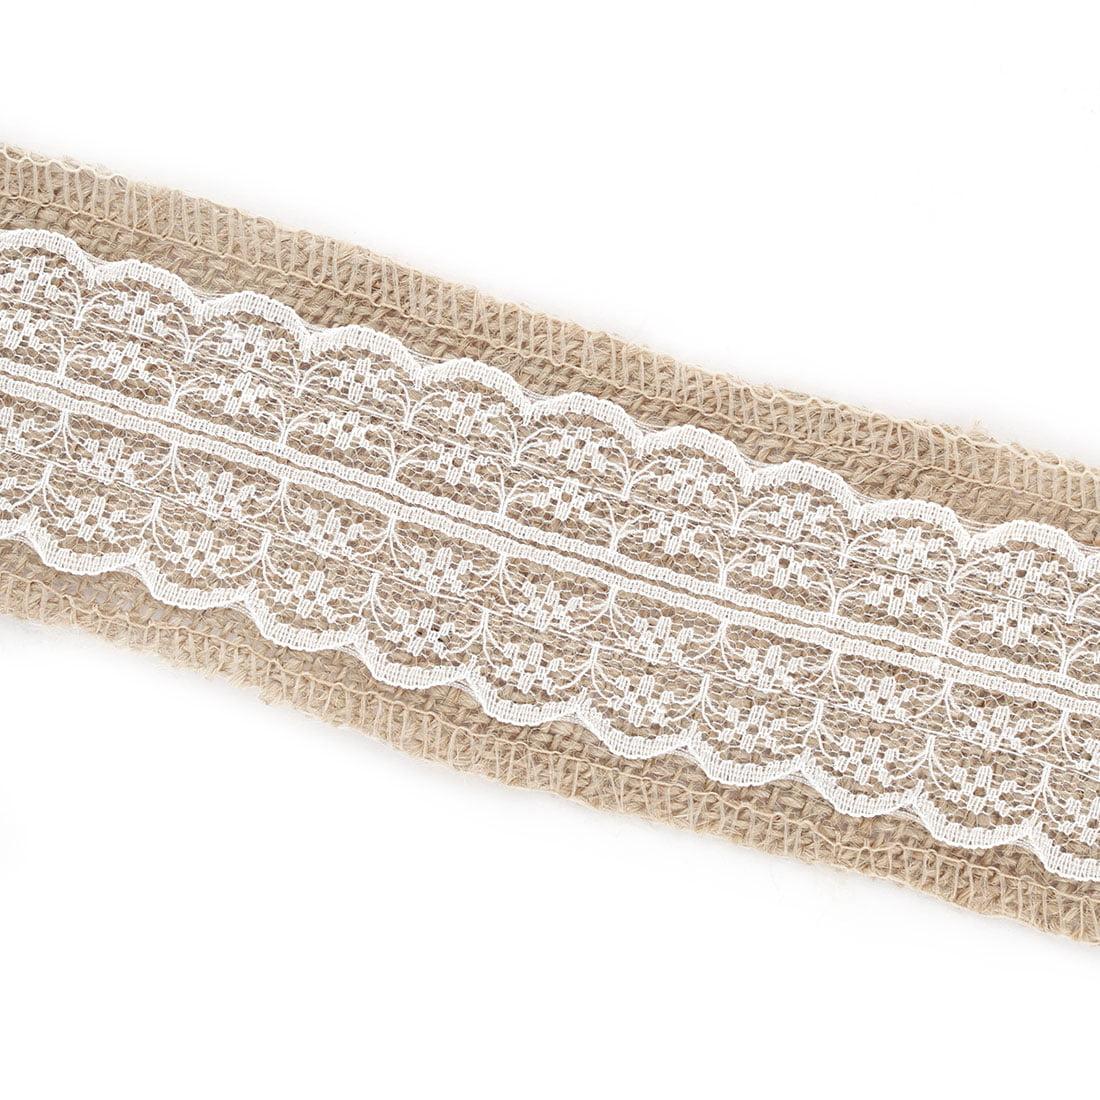 Wedding Burlap Handcraft Gift Packing Belt Ribbon Roll Decor White 4.4 Yards - image 2 of 5